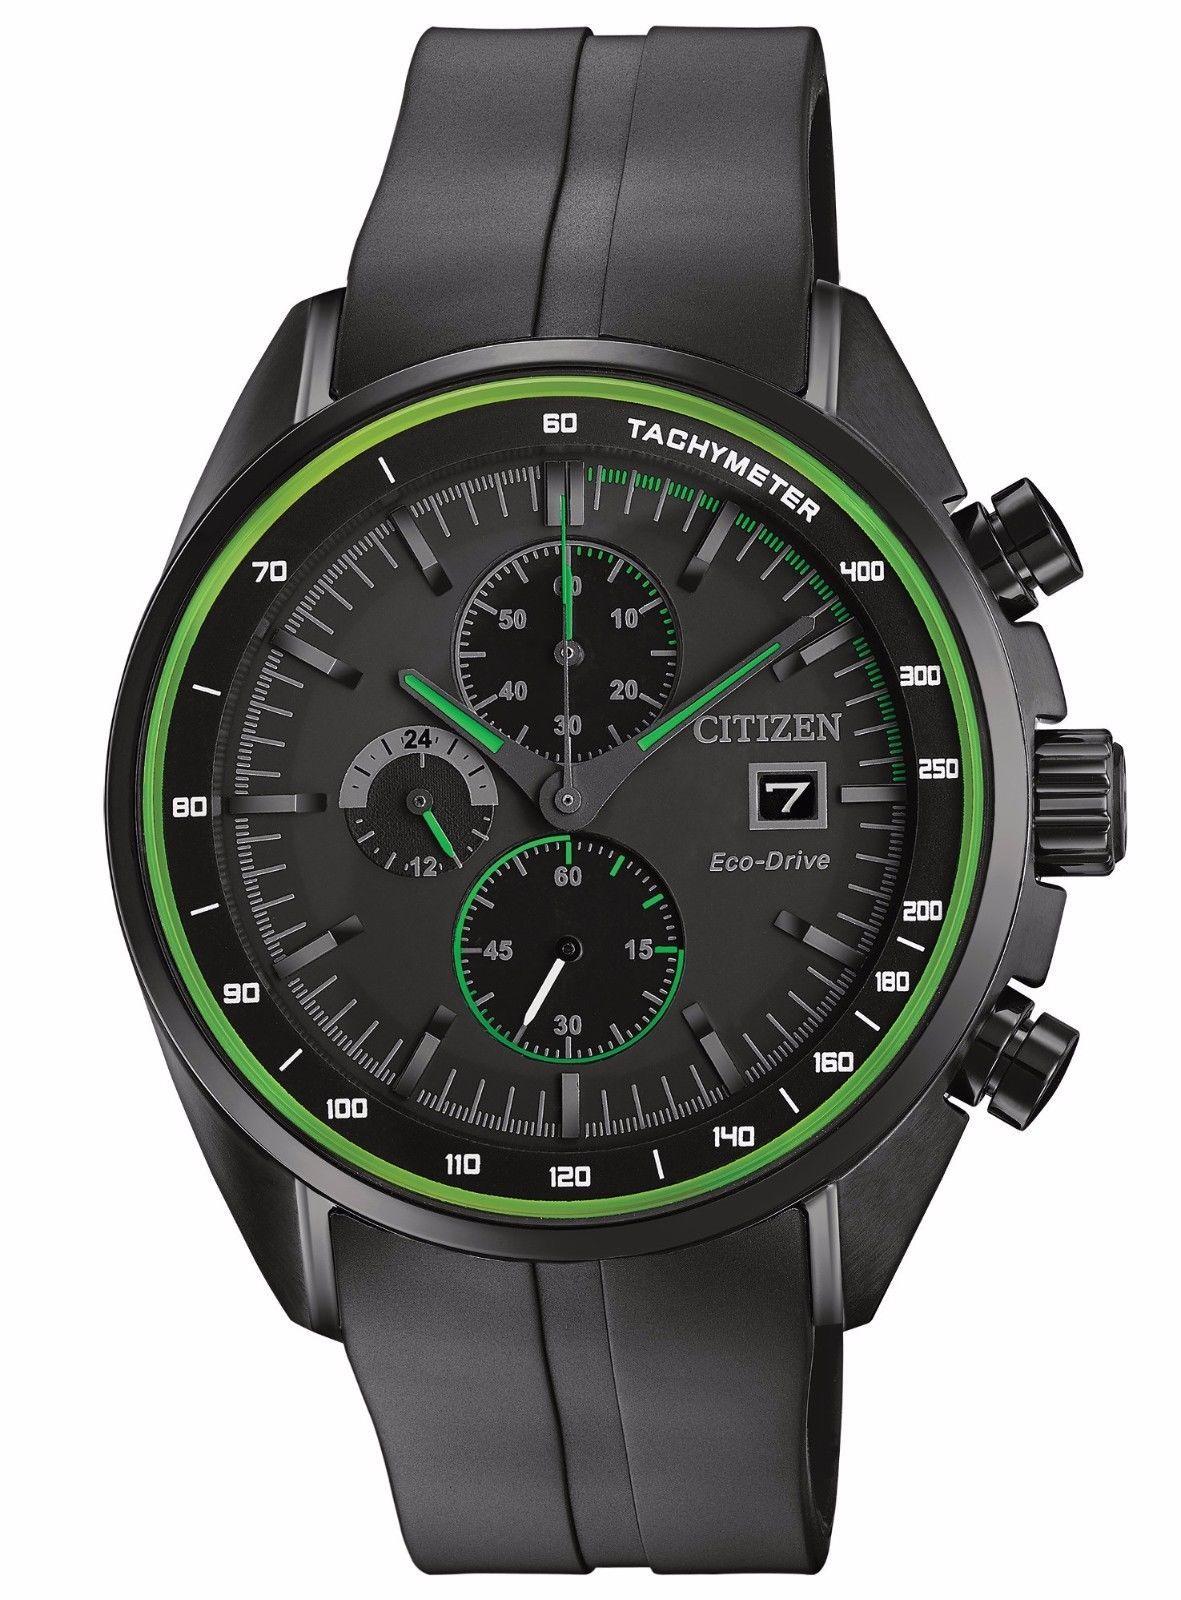 679cd4ac9 Citizen Eco-Drive Men's CA0595-11E Chronograph Green Accents Black Sport  Watch #black #sport #watch #accents #green #drive #mens #chronograph  #citizen